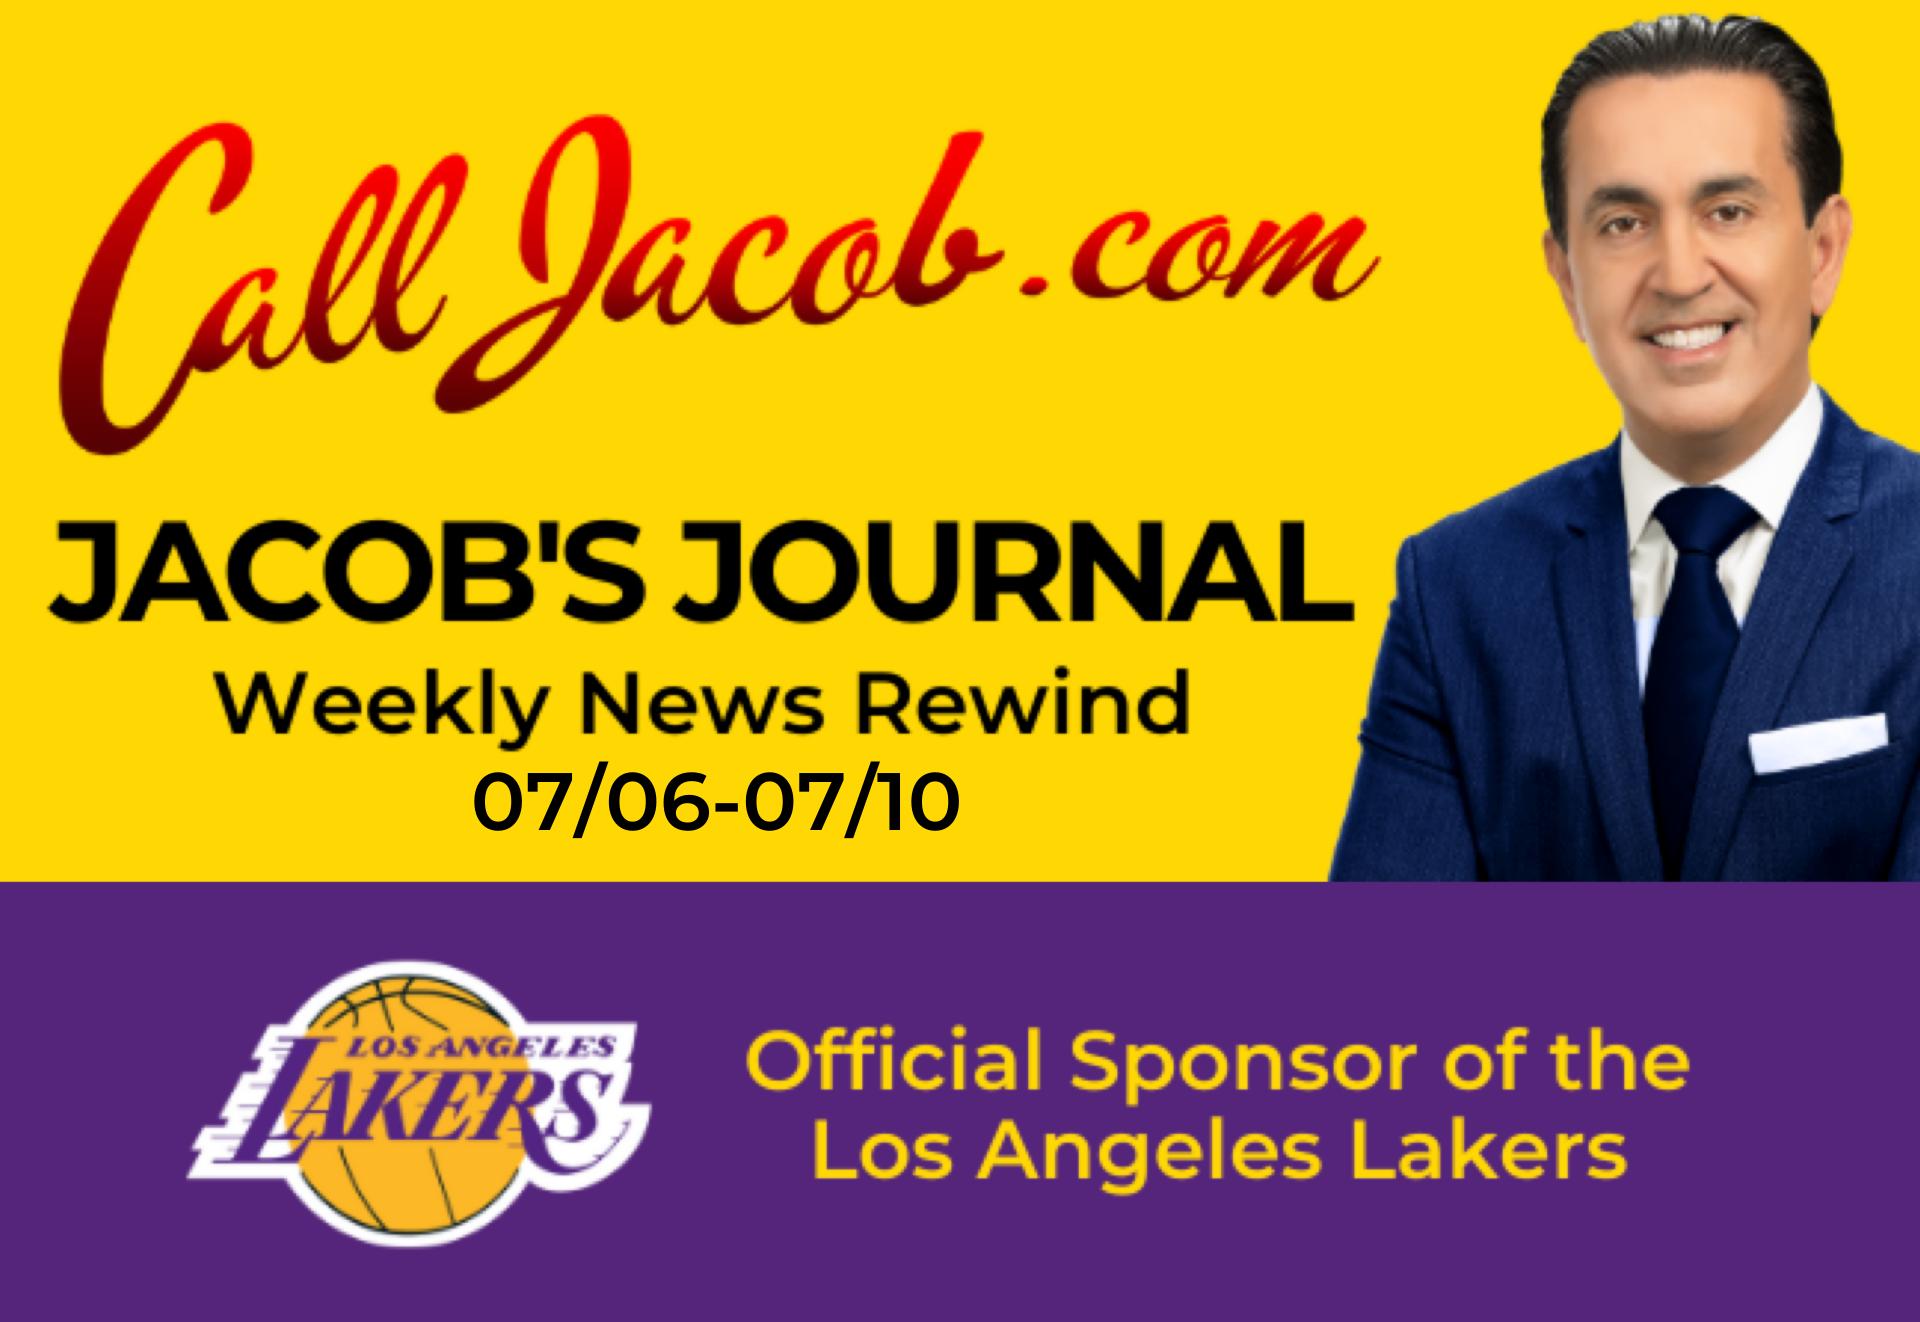 JacobsJournalWeeklyNewsRewind-07_06-07_10